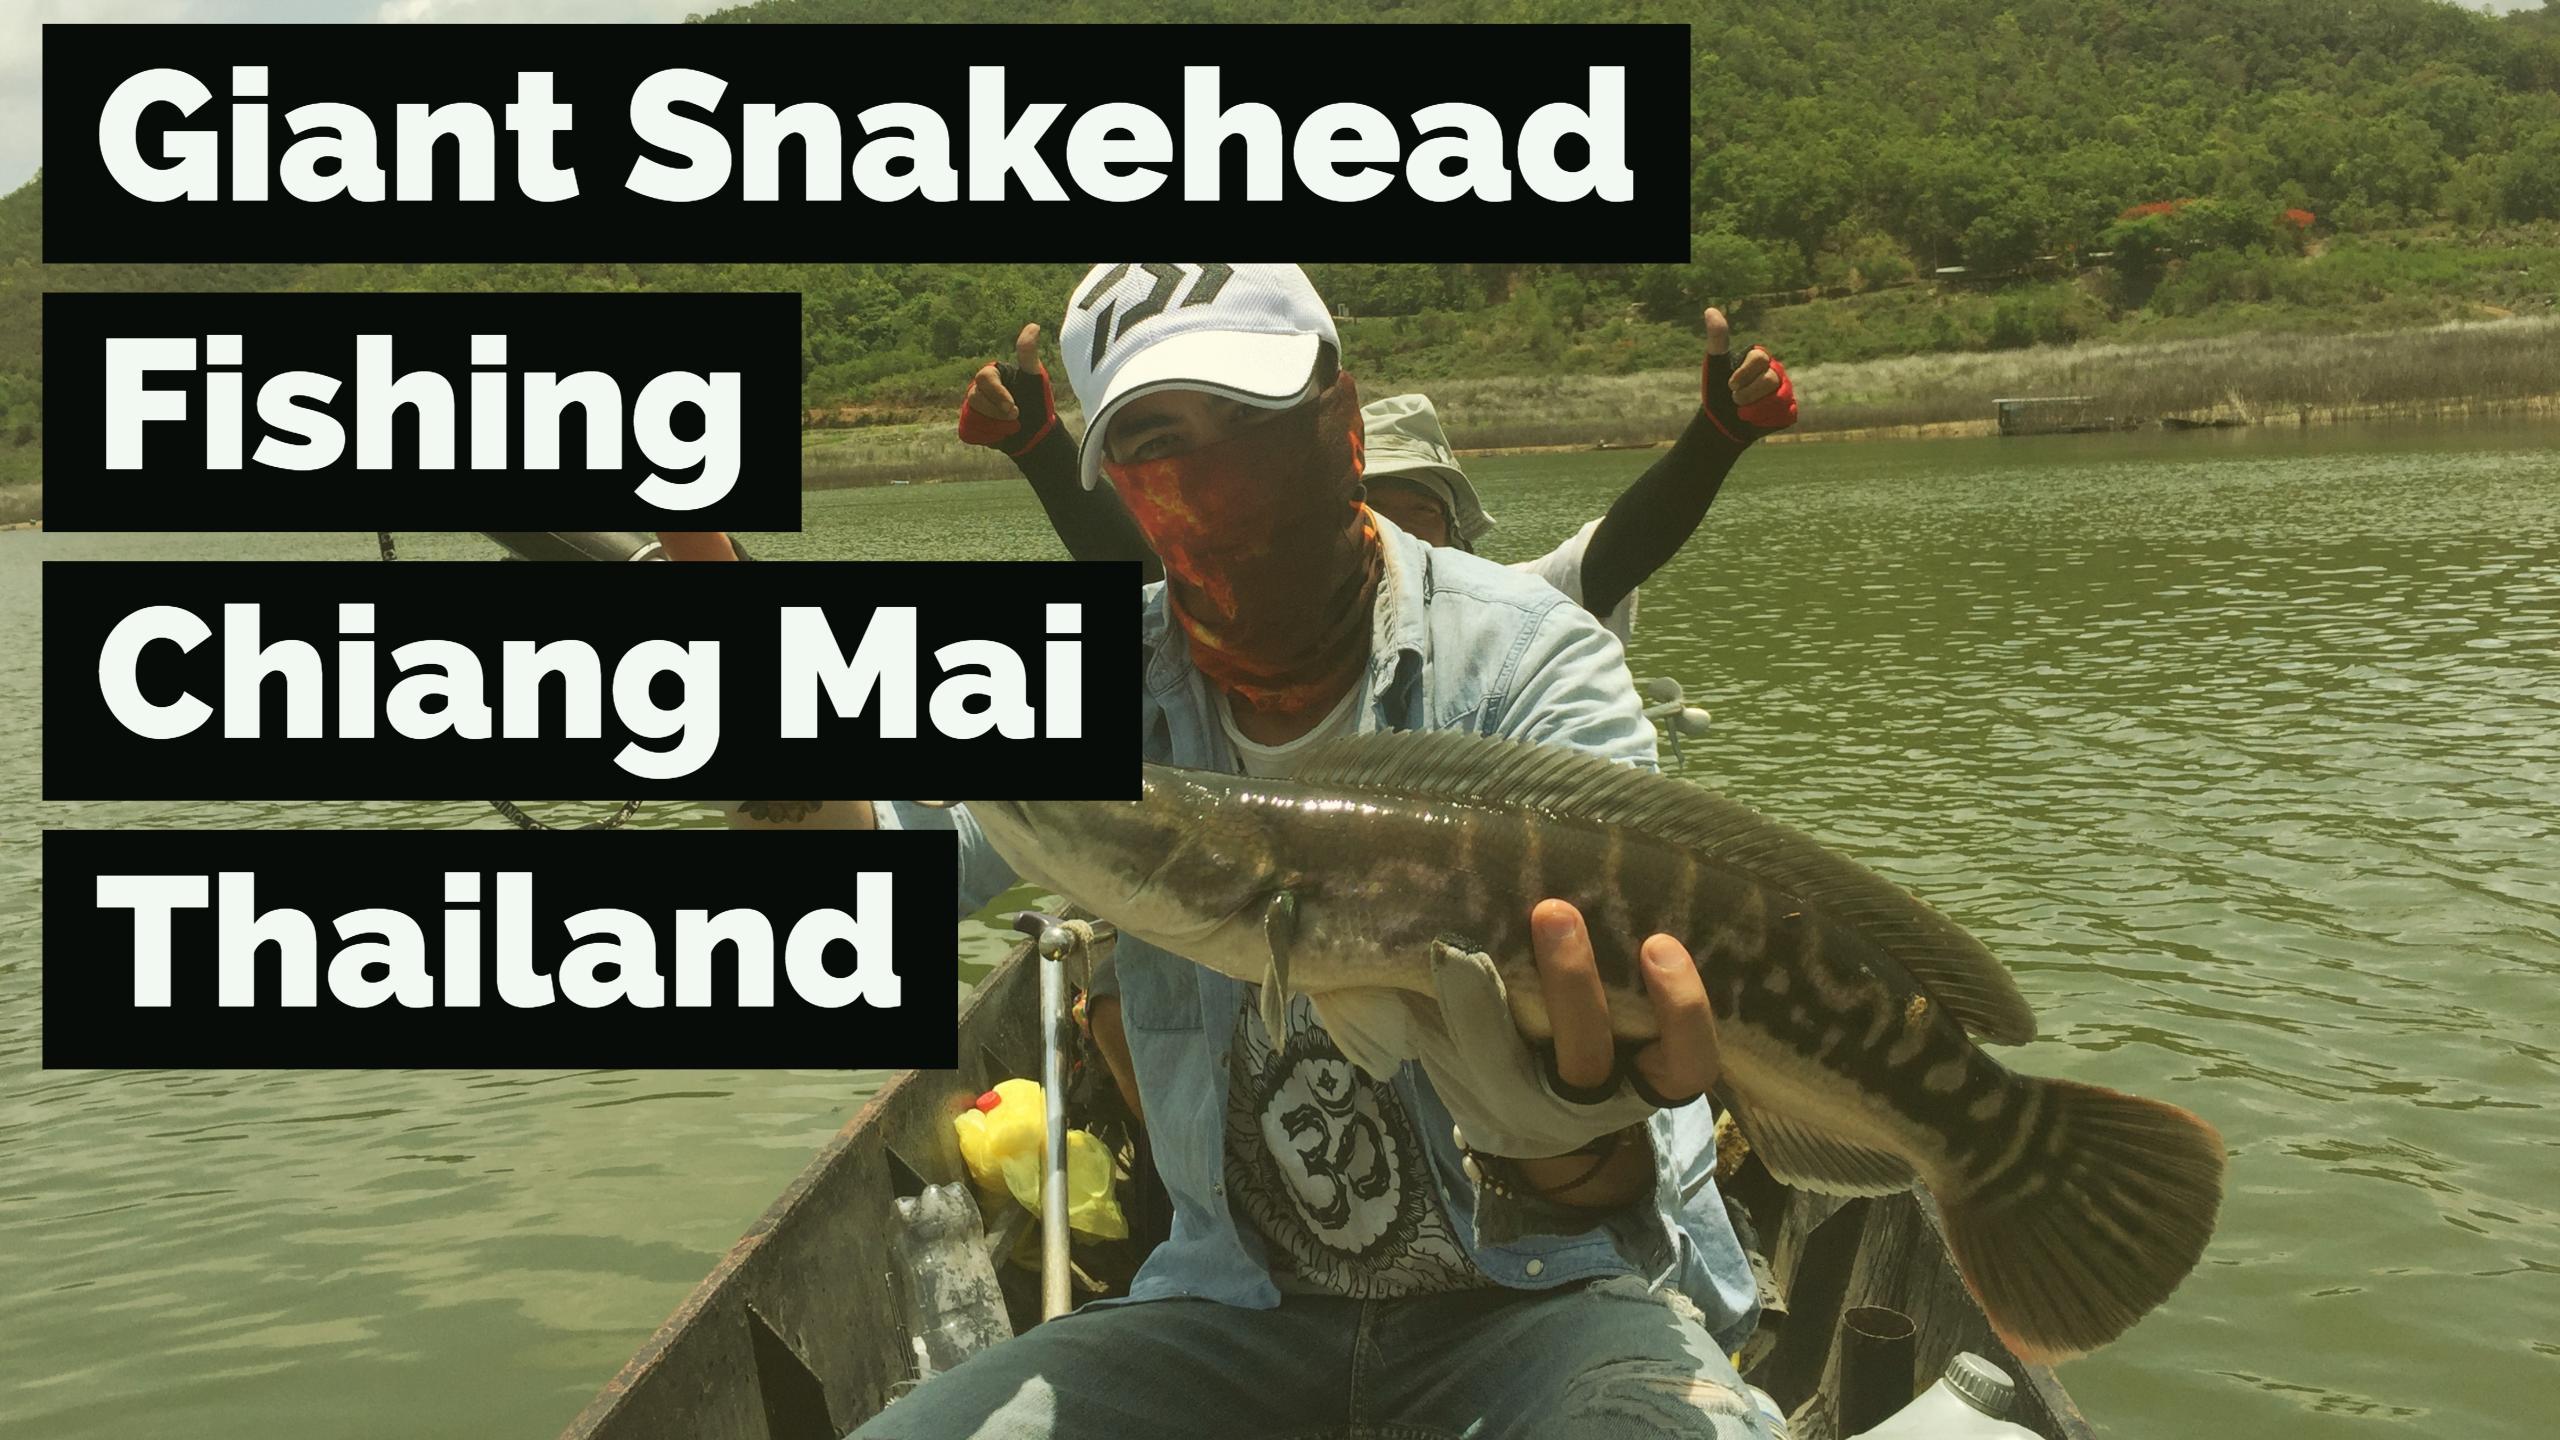 På fisketur efter Giant Snakehead